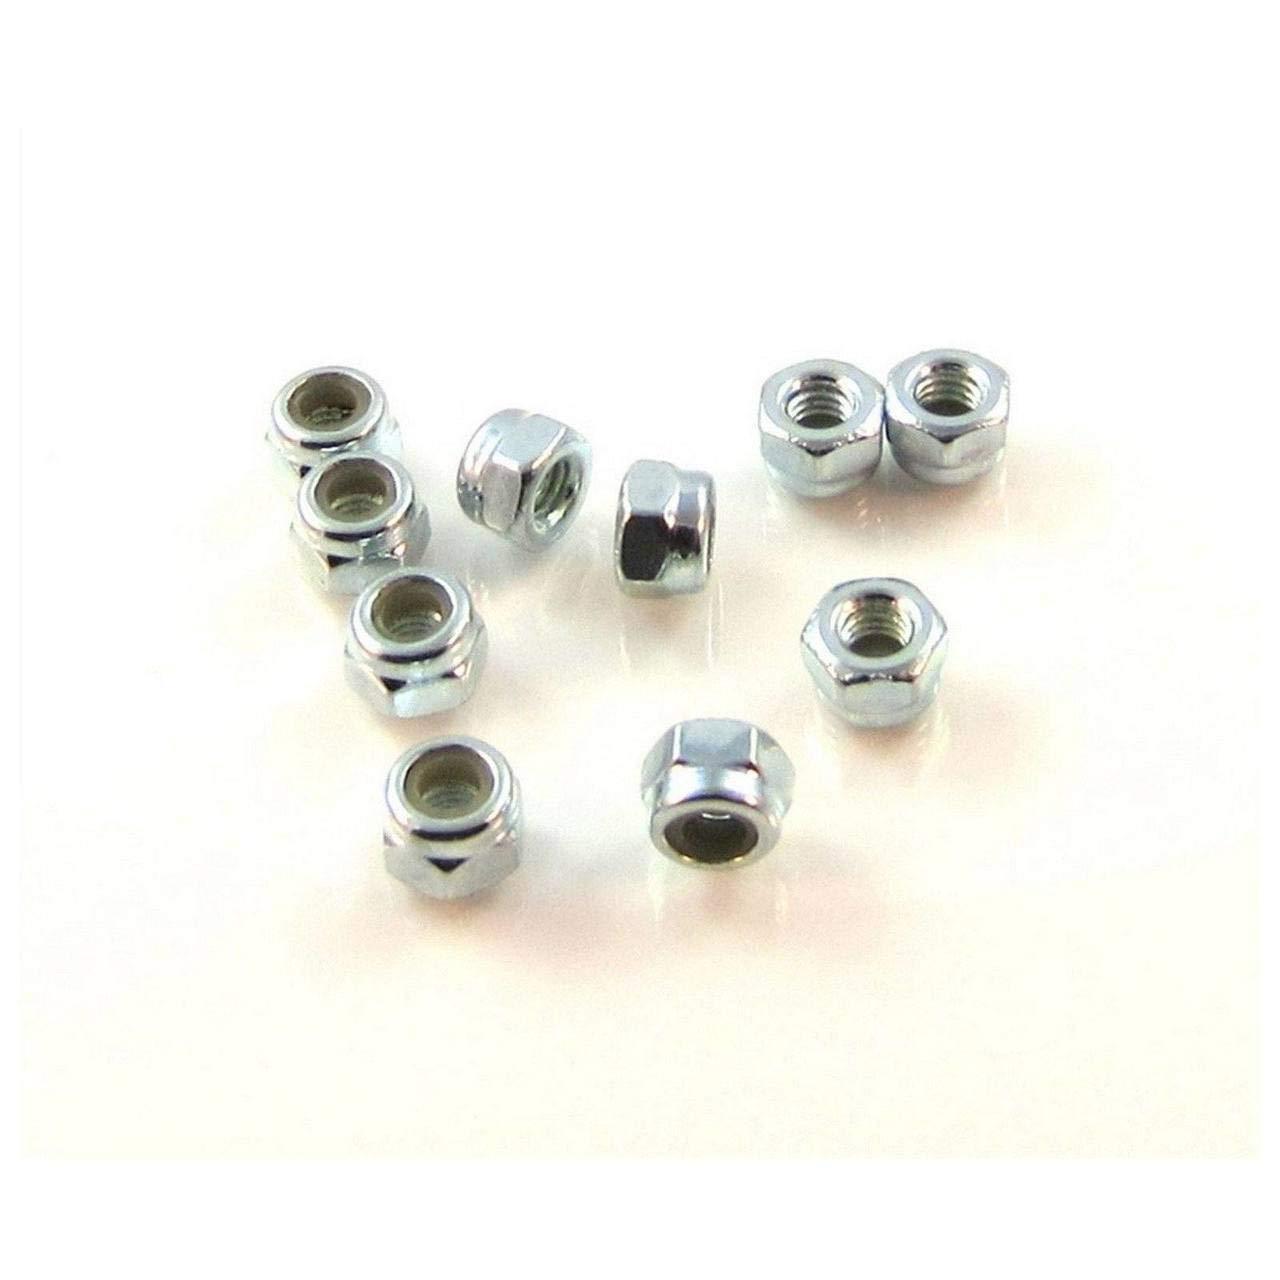 TRB RC 3mm Steel Nylon Fashionable Fashionable Insert 5.5mm 10pcs Locknut Hex DIN-98